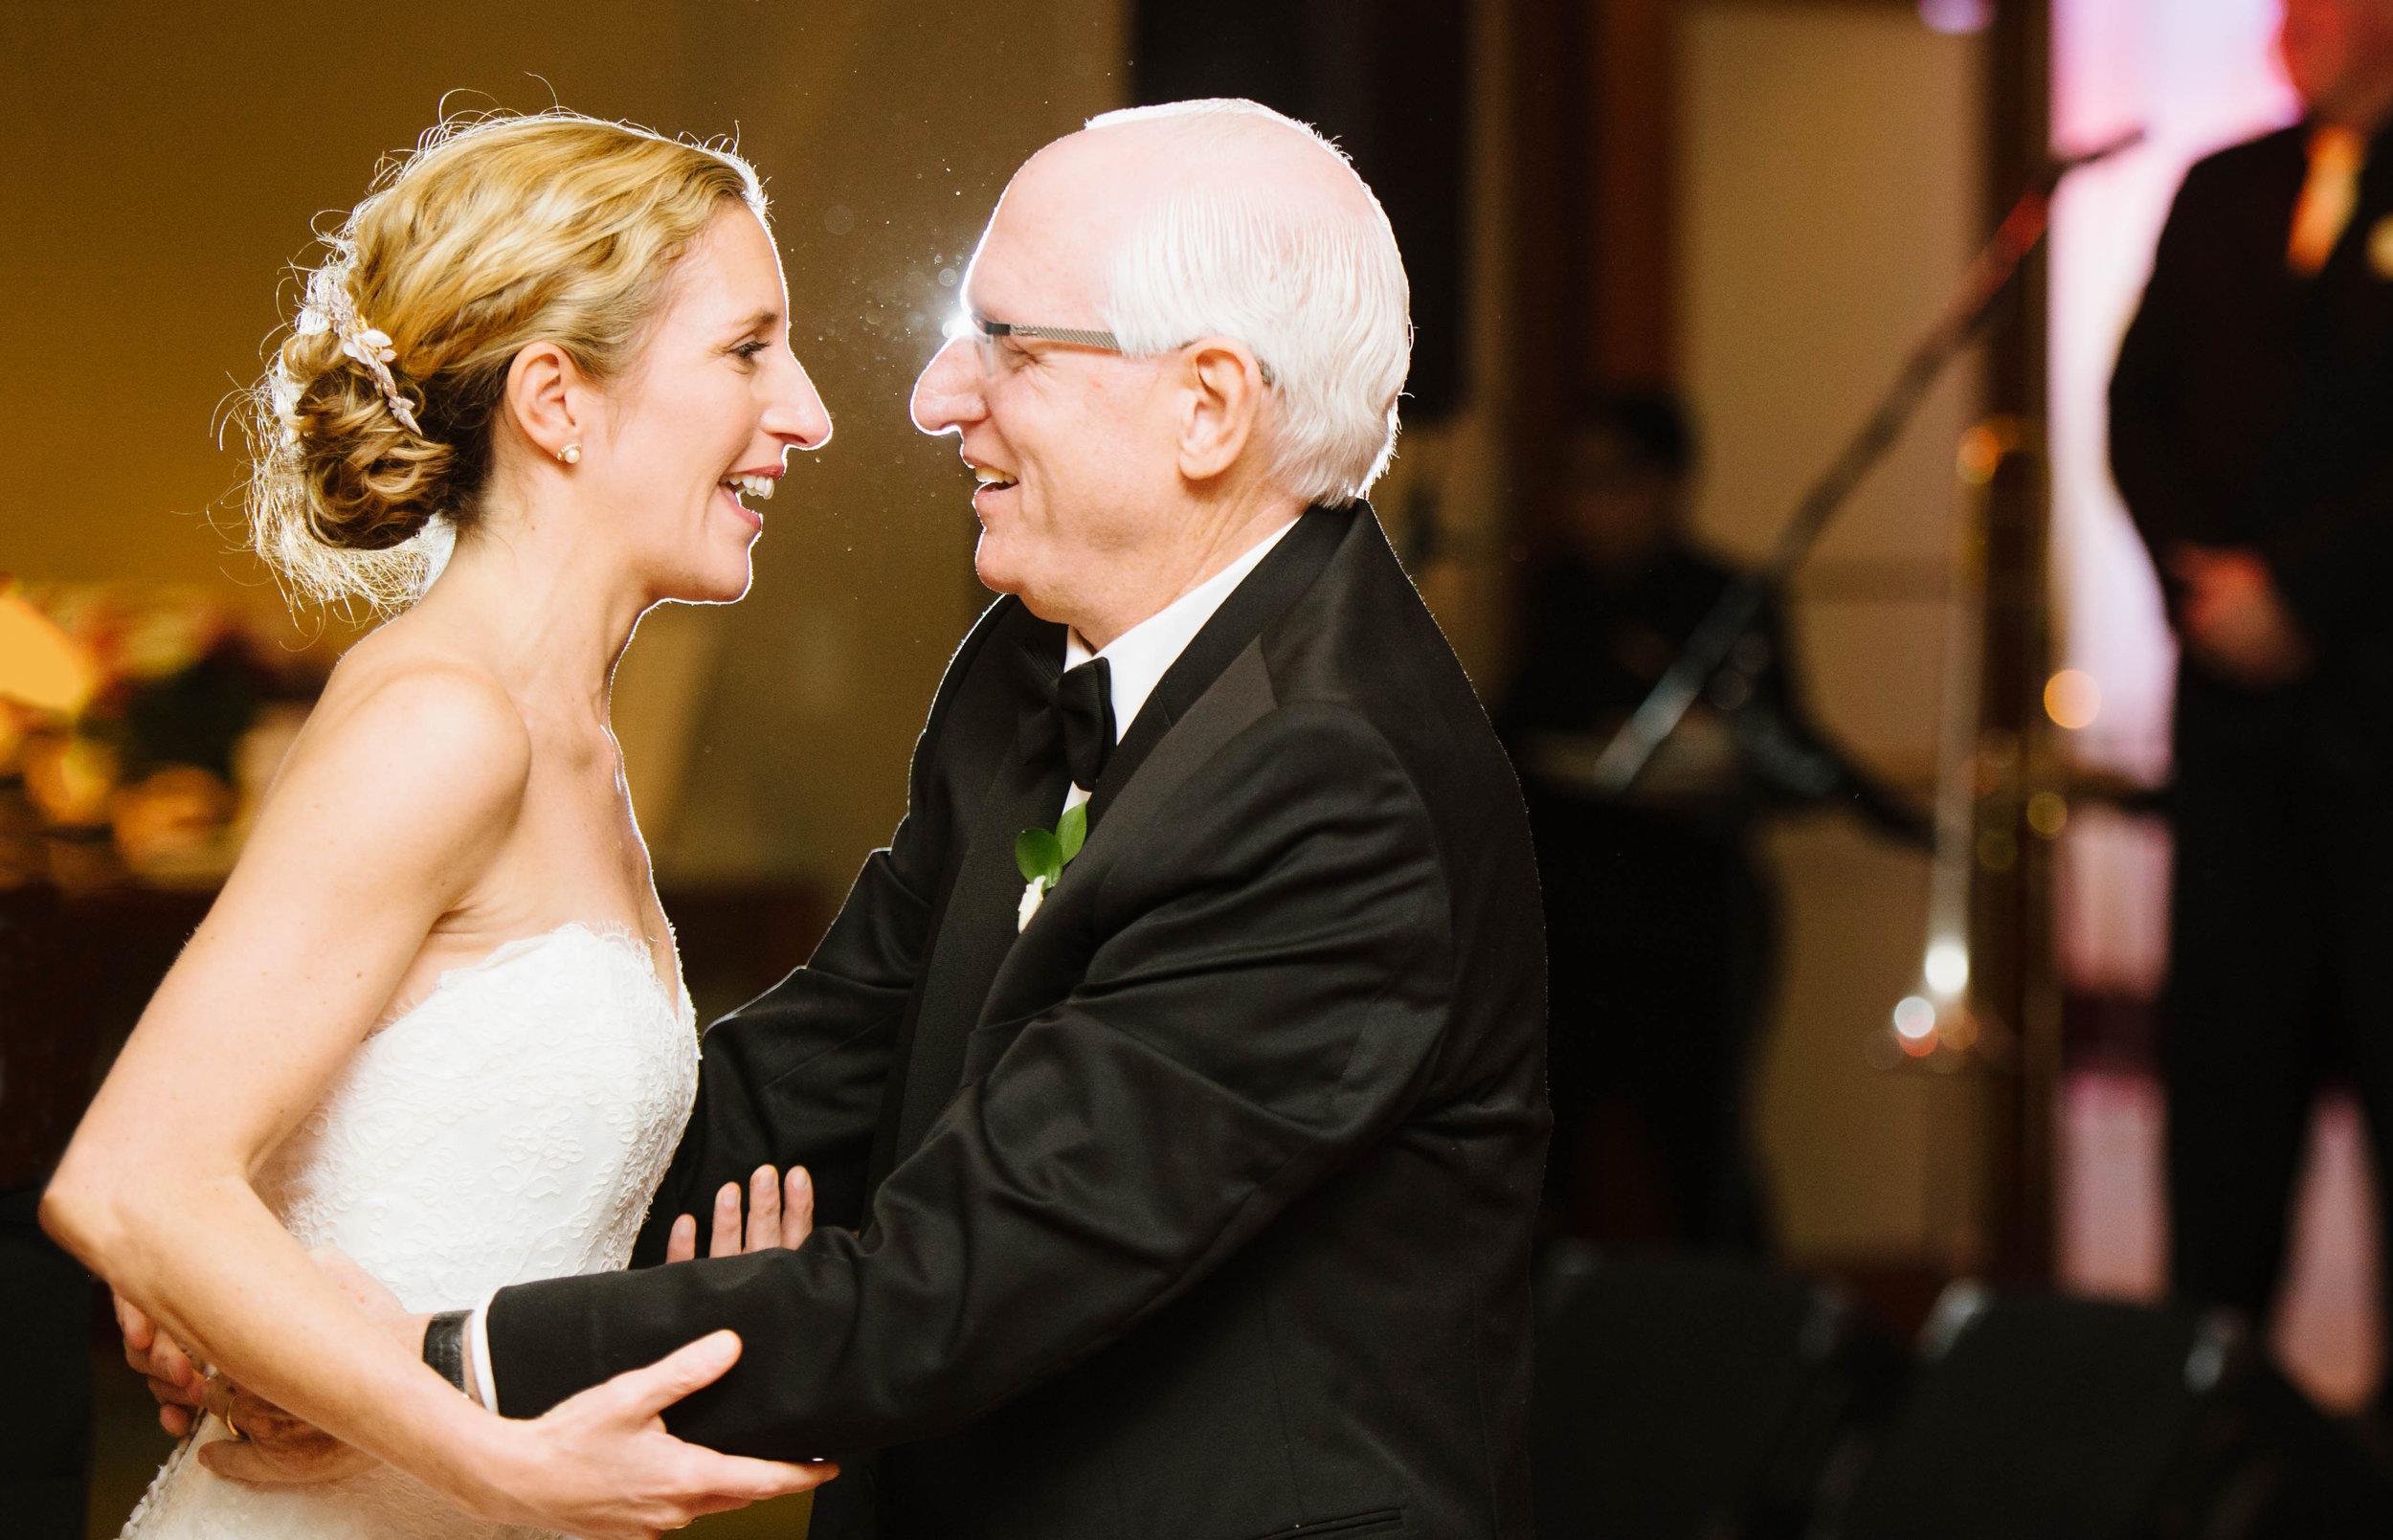 Emotional-Wedding-Photography-Boston46.jpg